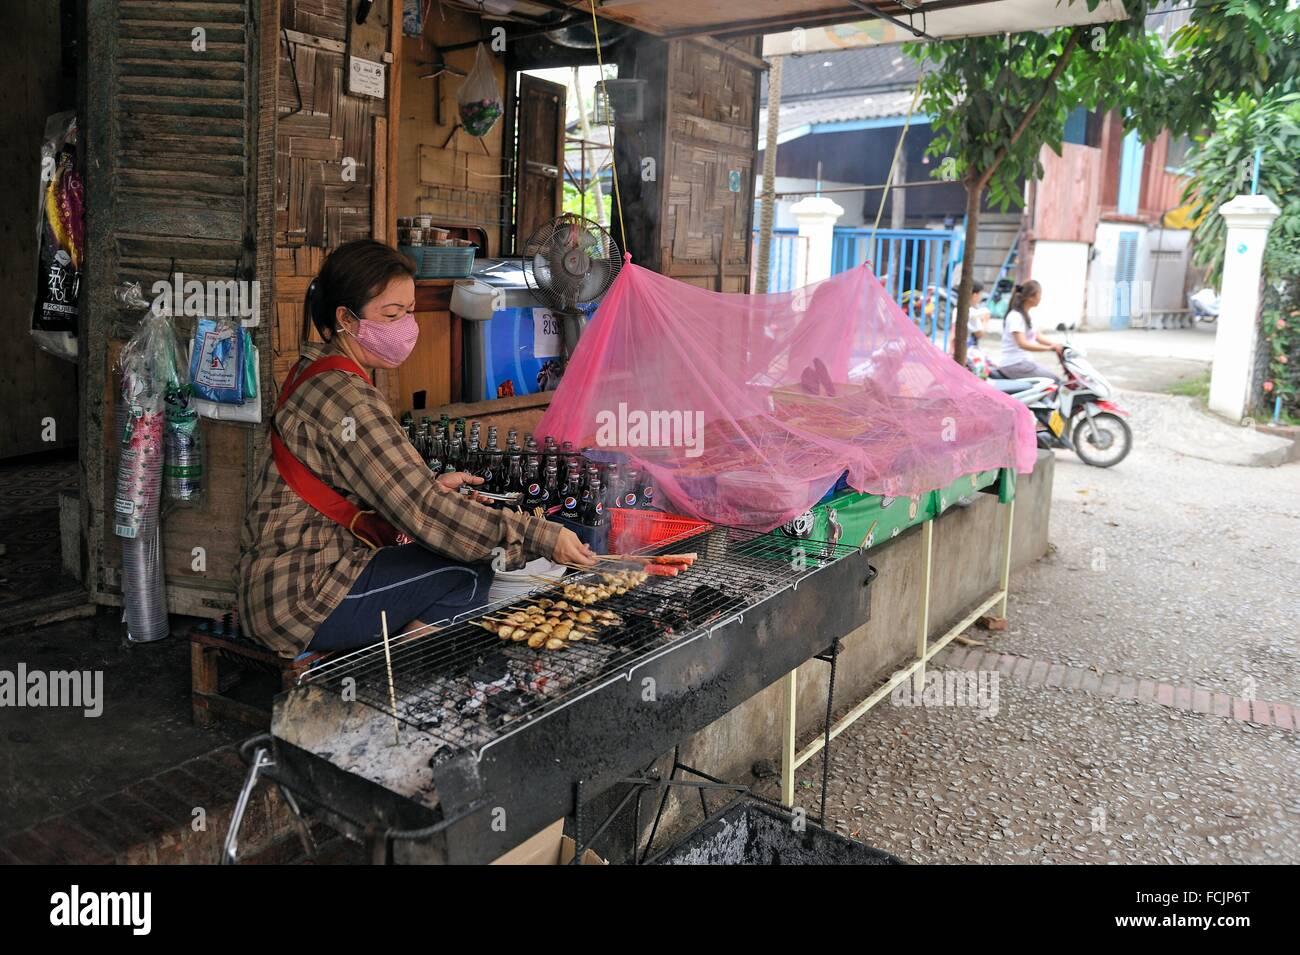 Spieße in ein billiges Restaurant, Luang Prabang, Laos, Südostasien. Stockbild